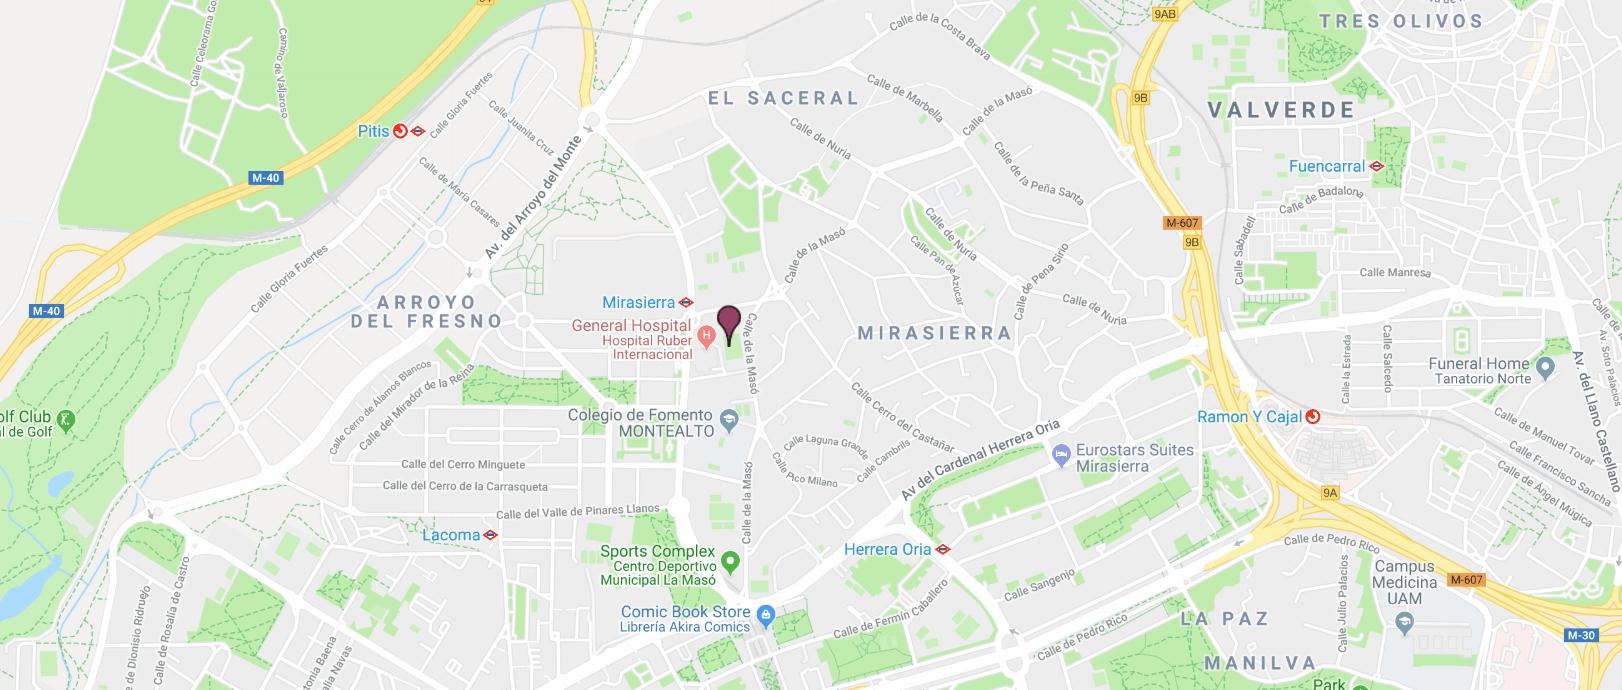 localizacion hospital ruber internacional mapa